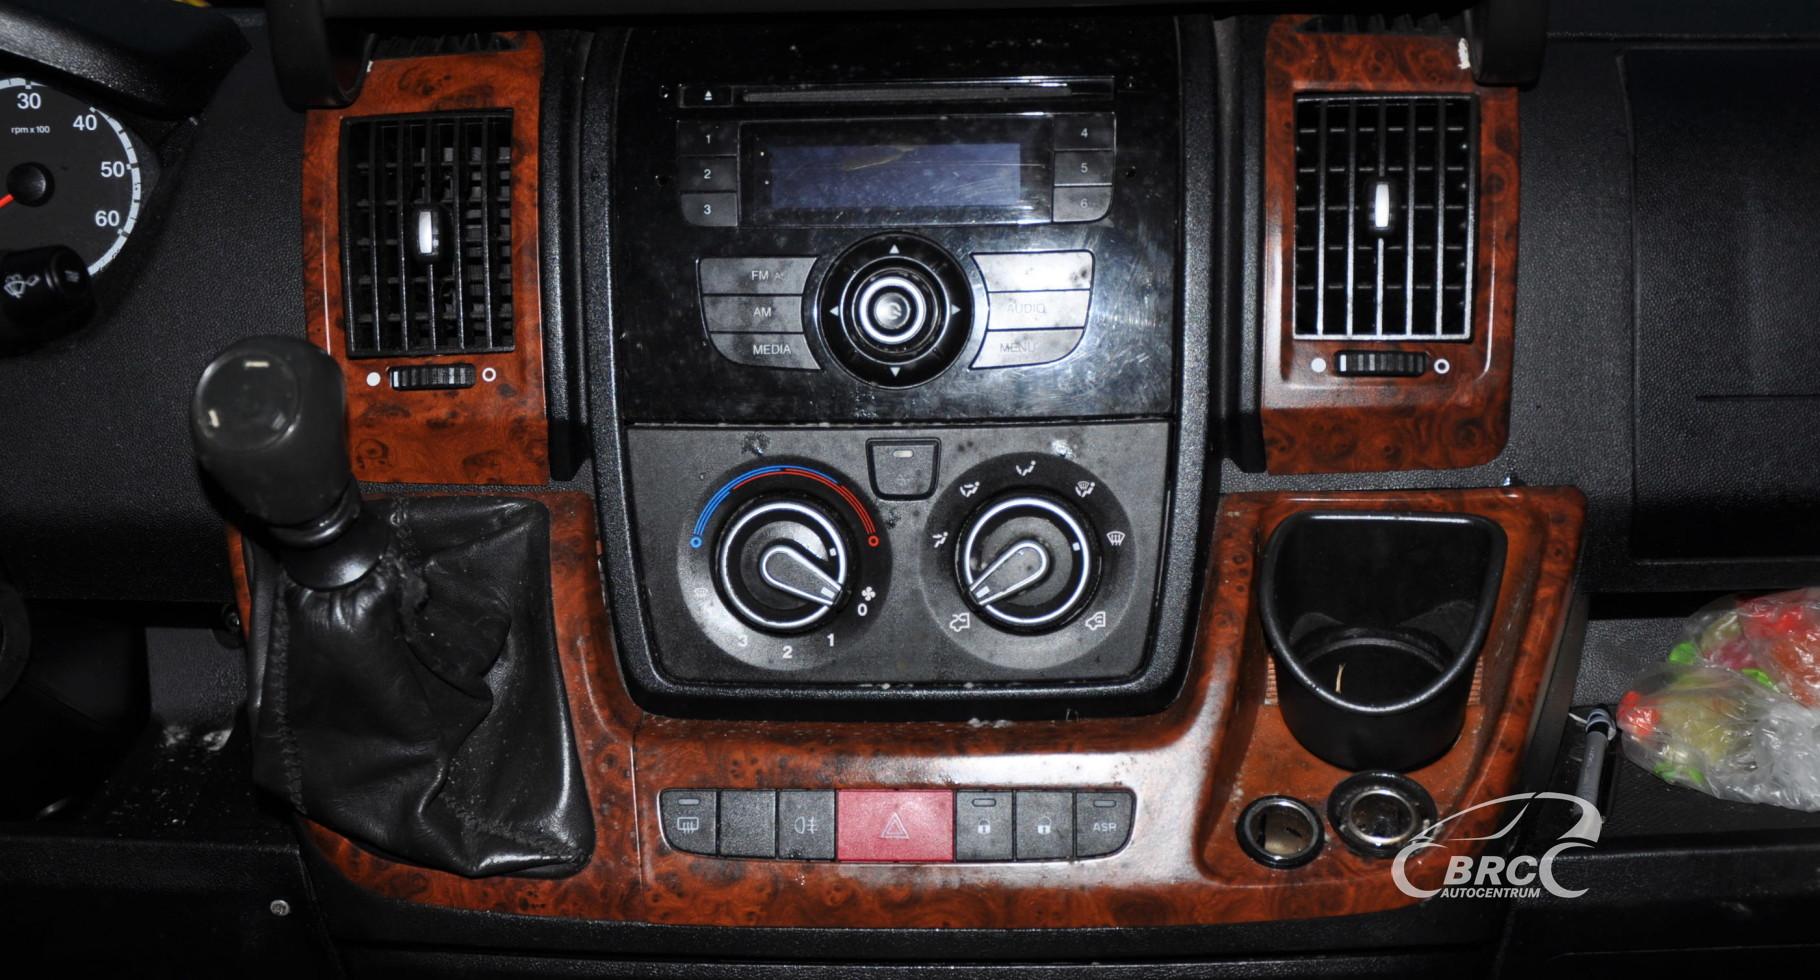 Fiat Ducato 2.3 HDI Multijet MAXI Variklio defektas